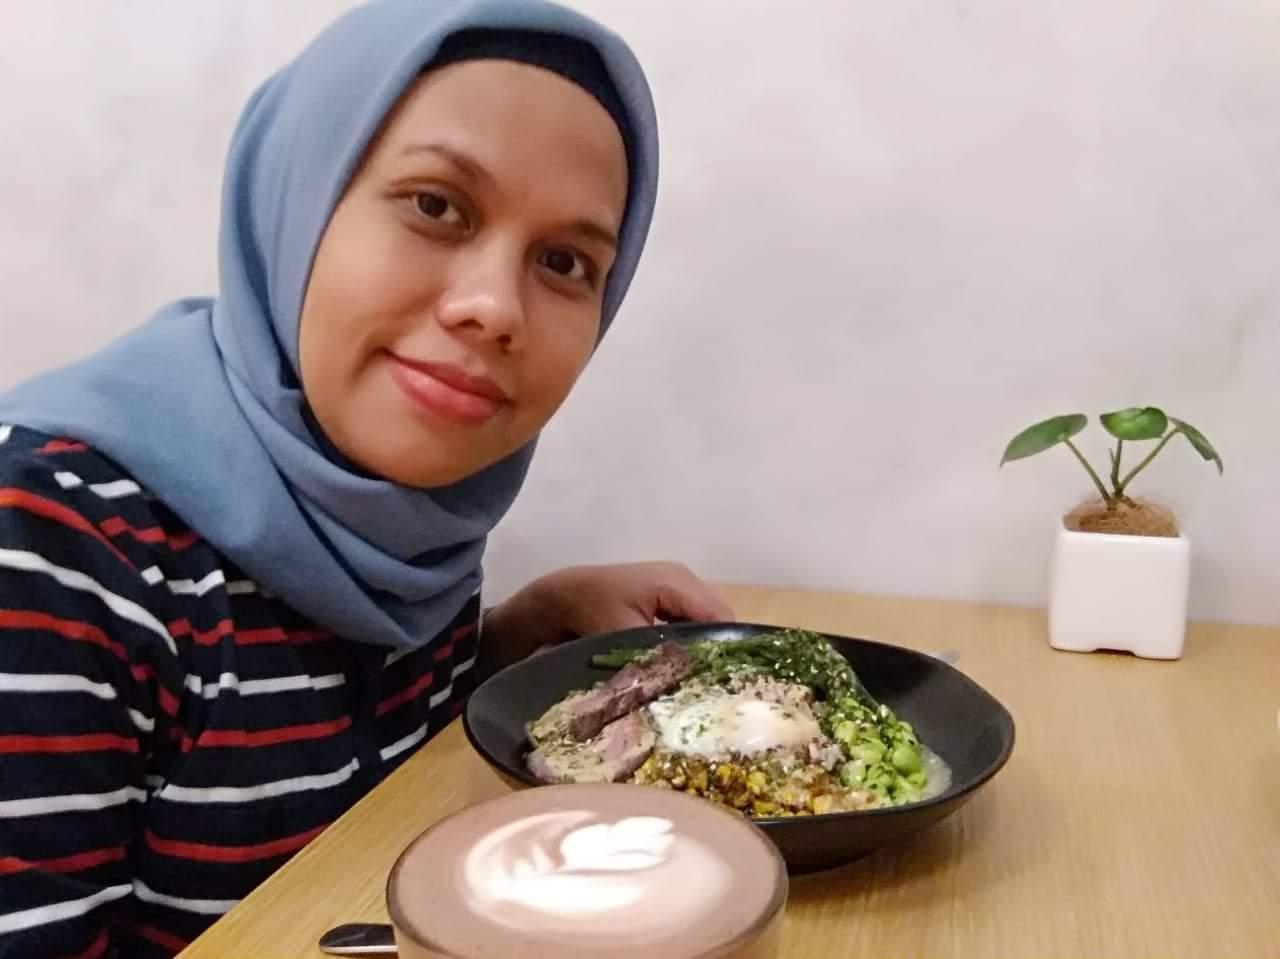 Fedwell, Tempat Makan sehat dan enak yang wajib coba di Jakarta selatan